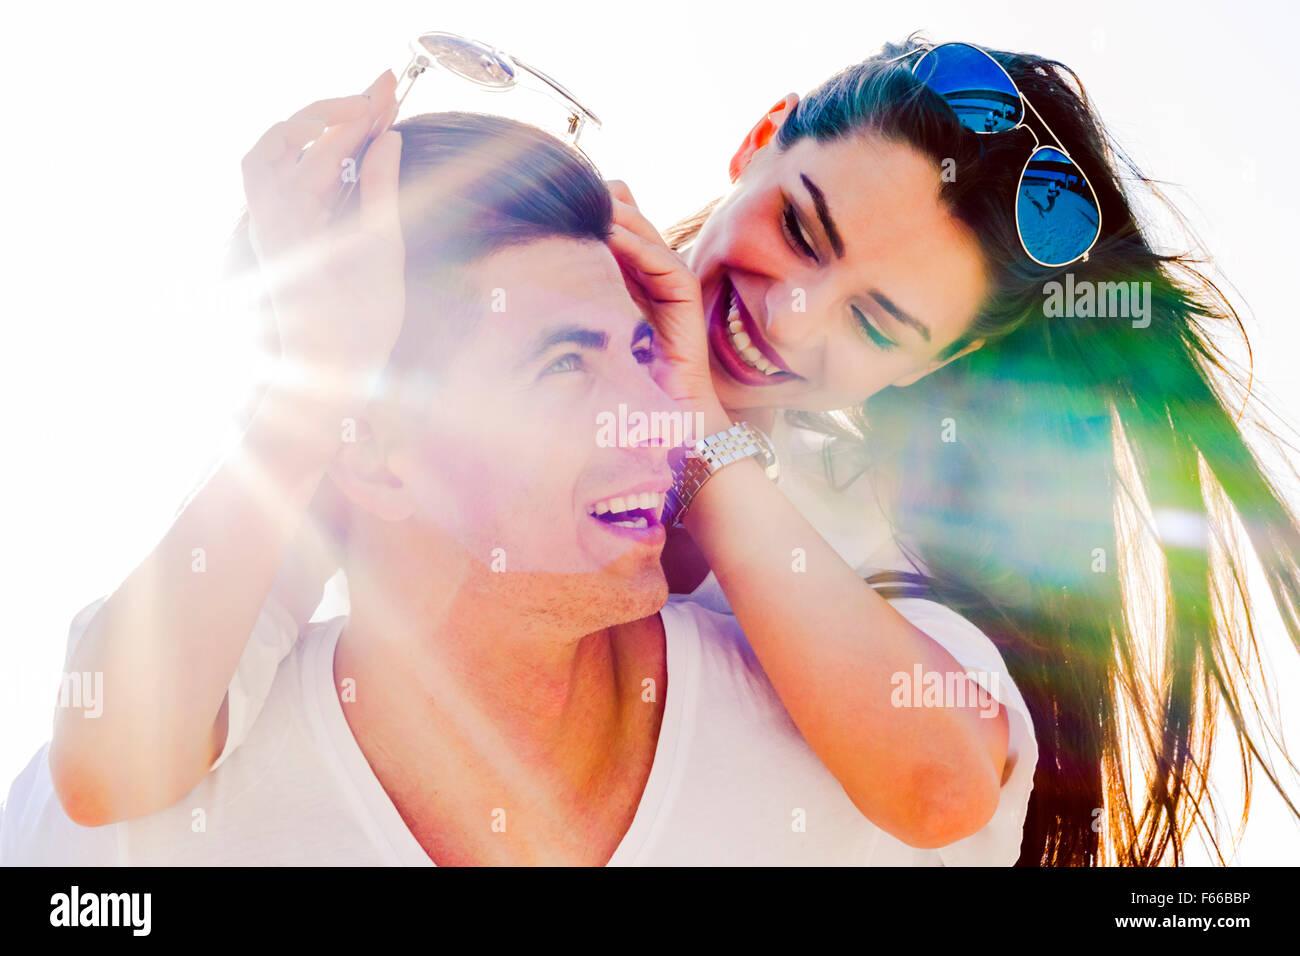 Cheerful handsome man carrying son amie sur le dos sur la plage Photo Stock